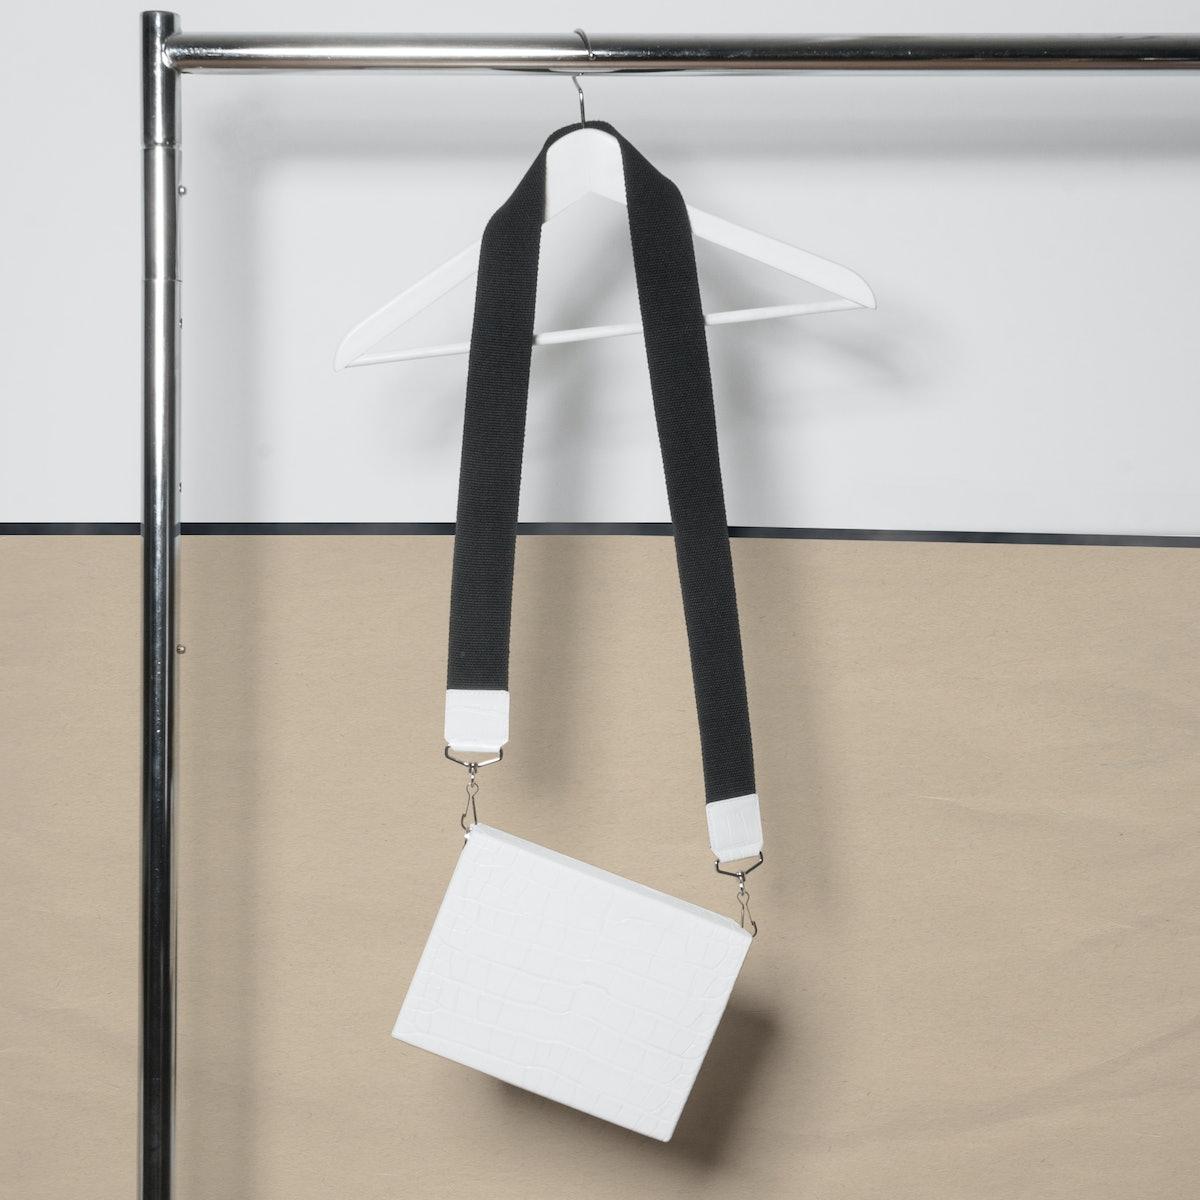 Victoria Beckham Spring 2015 Bag